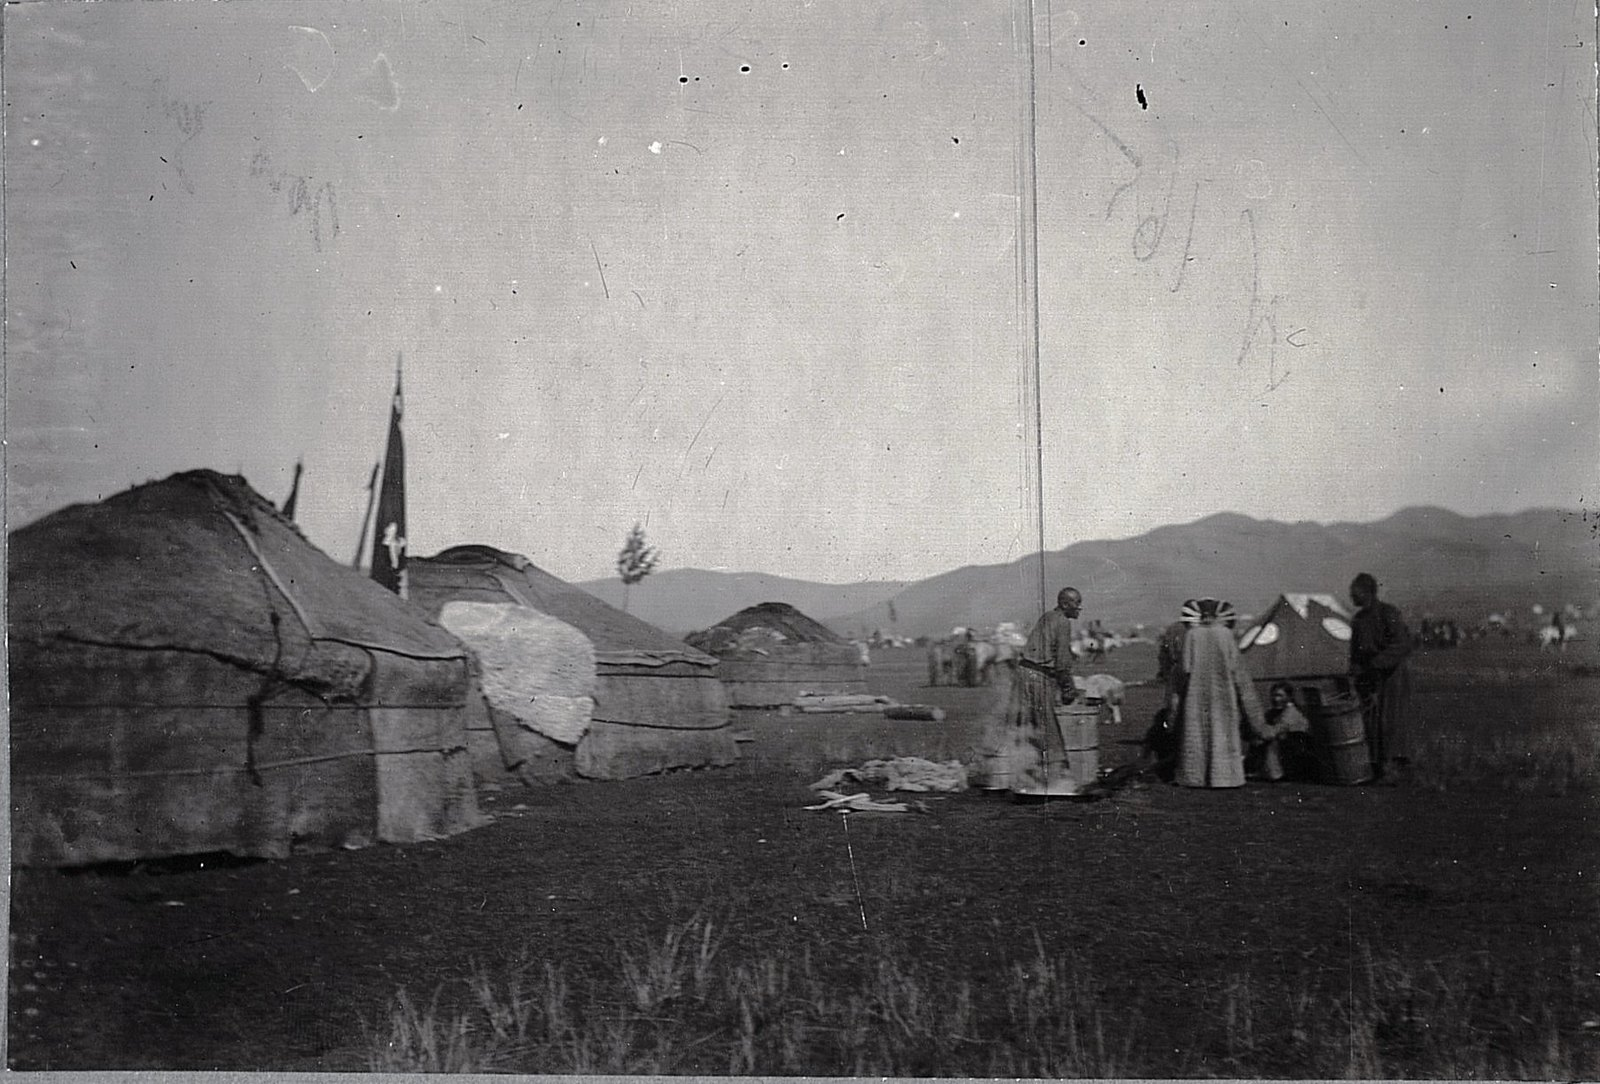 Урга. Юрты маньчжурских солдат